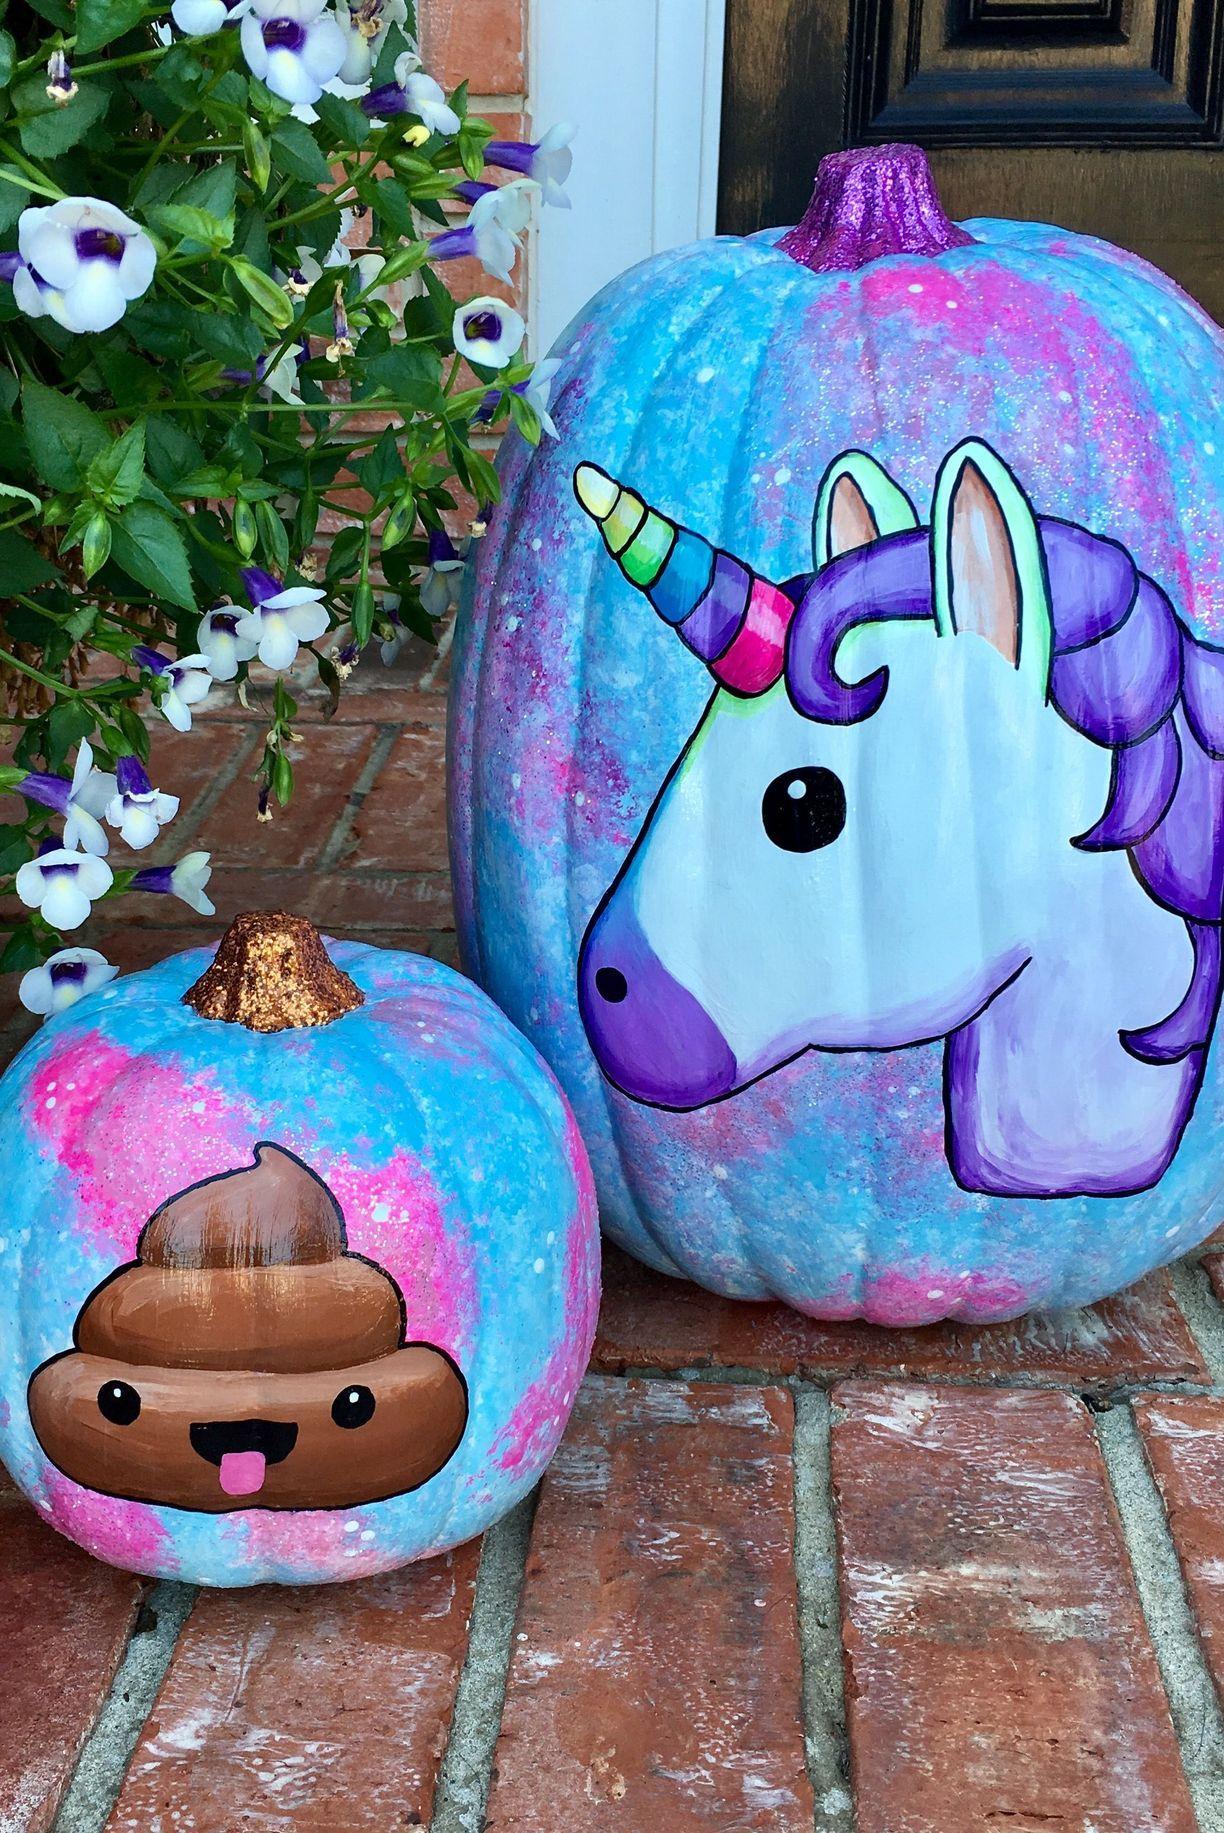 Halloween Emoji Text: 8 Easy Emoji Pumpkin Carving Ideas For Halloween